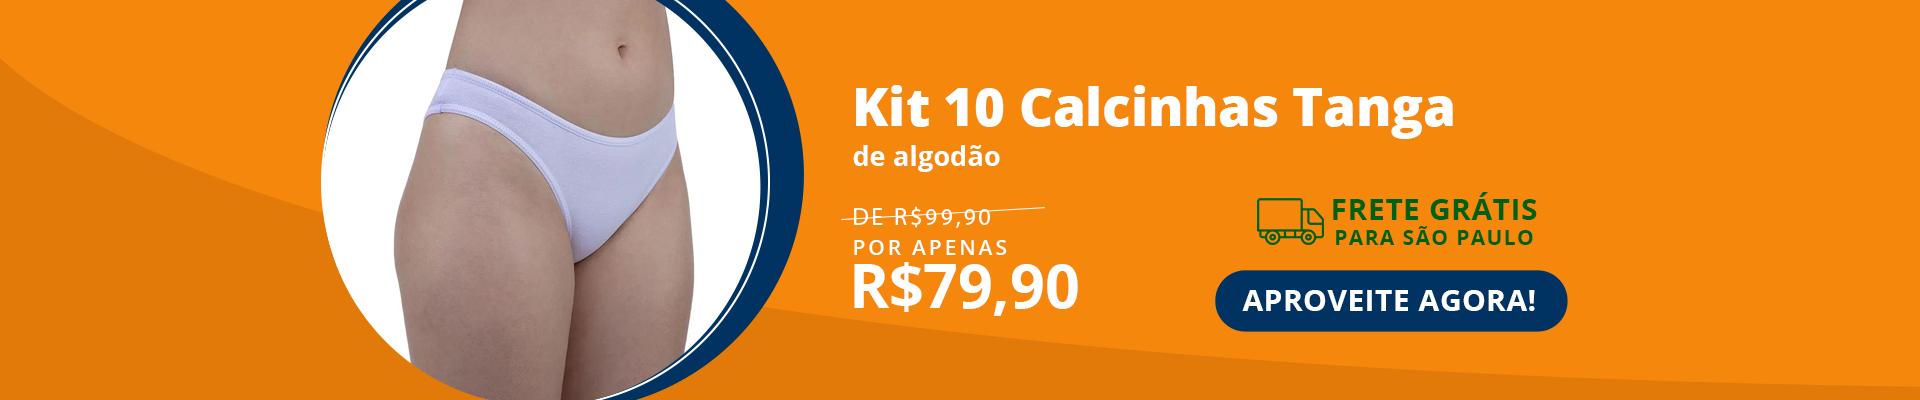 Banner A10 Kit 10